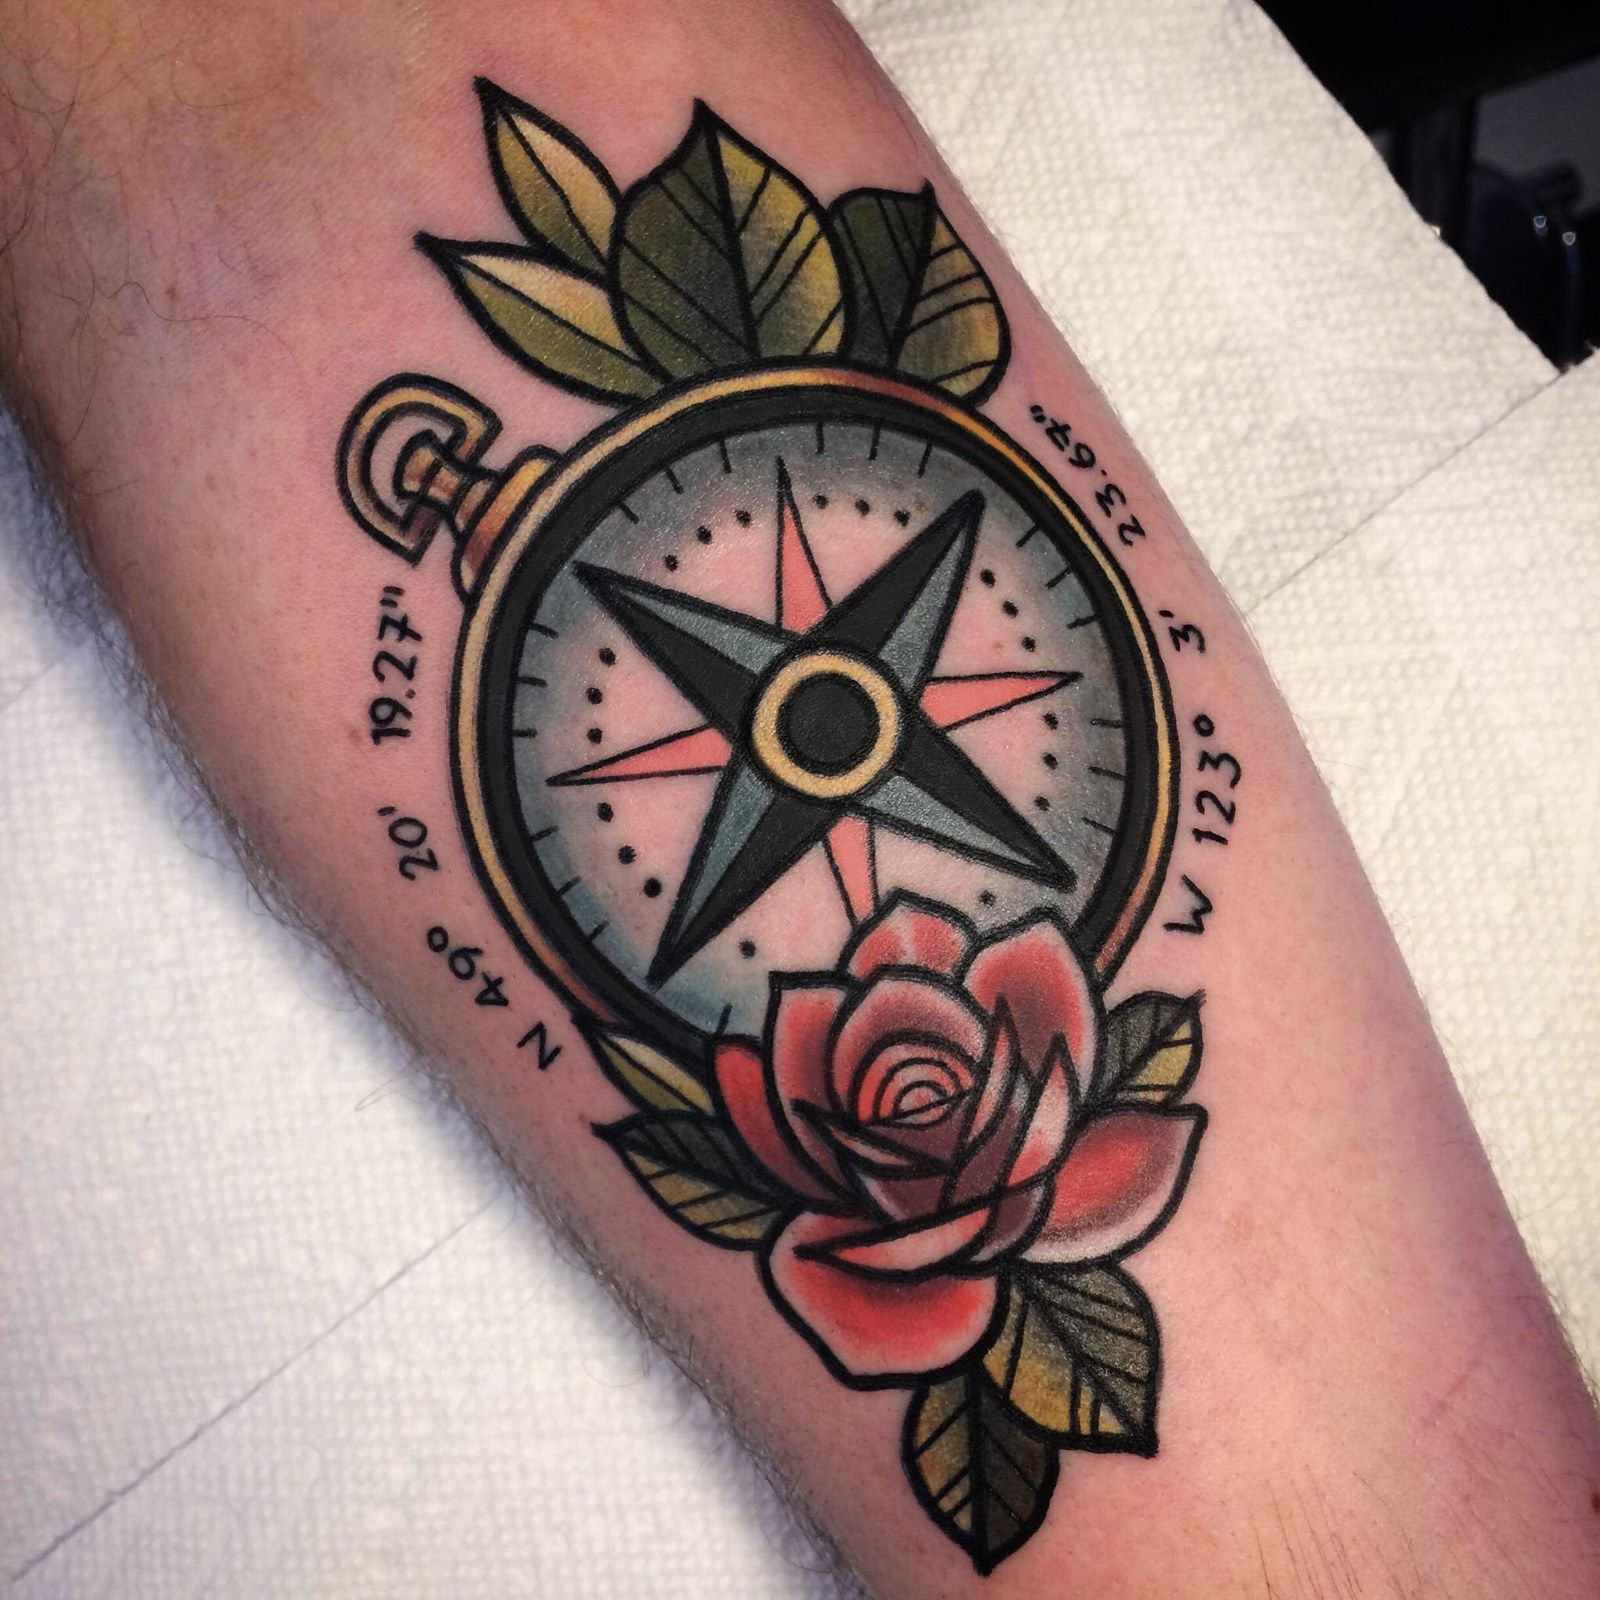 Just 27 Simple And Beautiful Rose Tattoo Ideas Rose Tattoos Sleeve Tattoos For Women Traditional Tattoo Sleeve